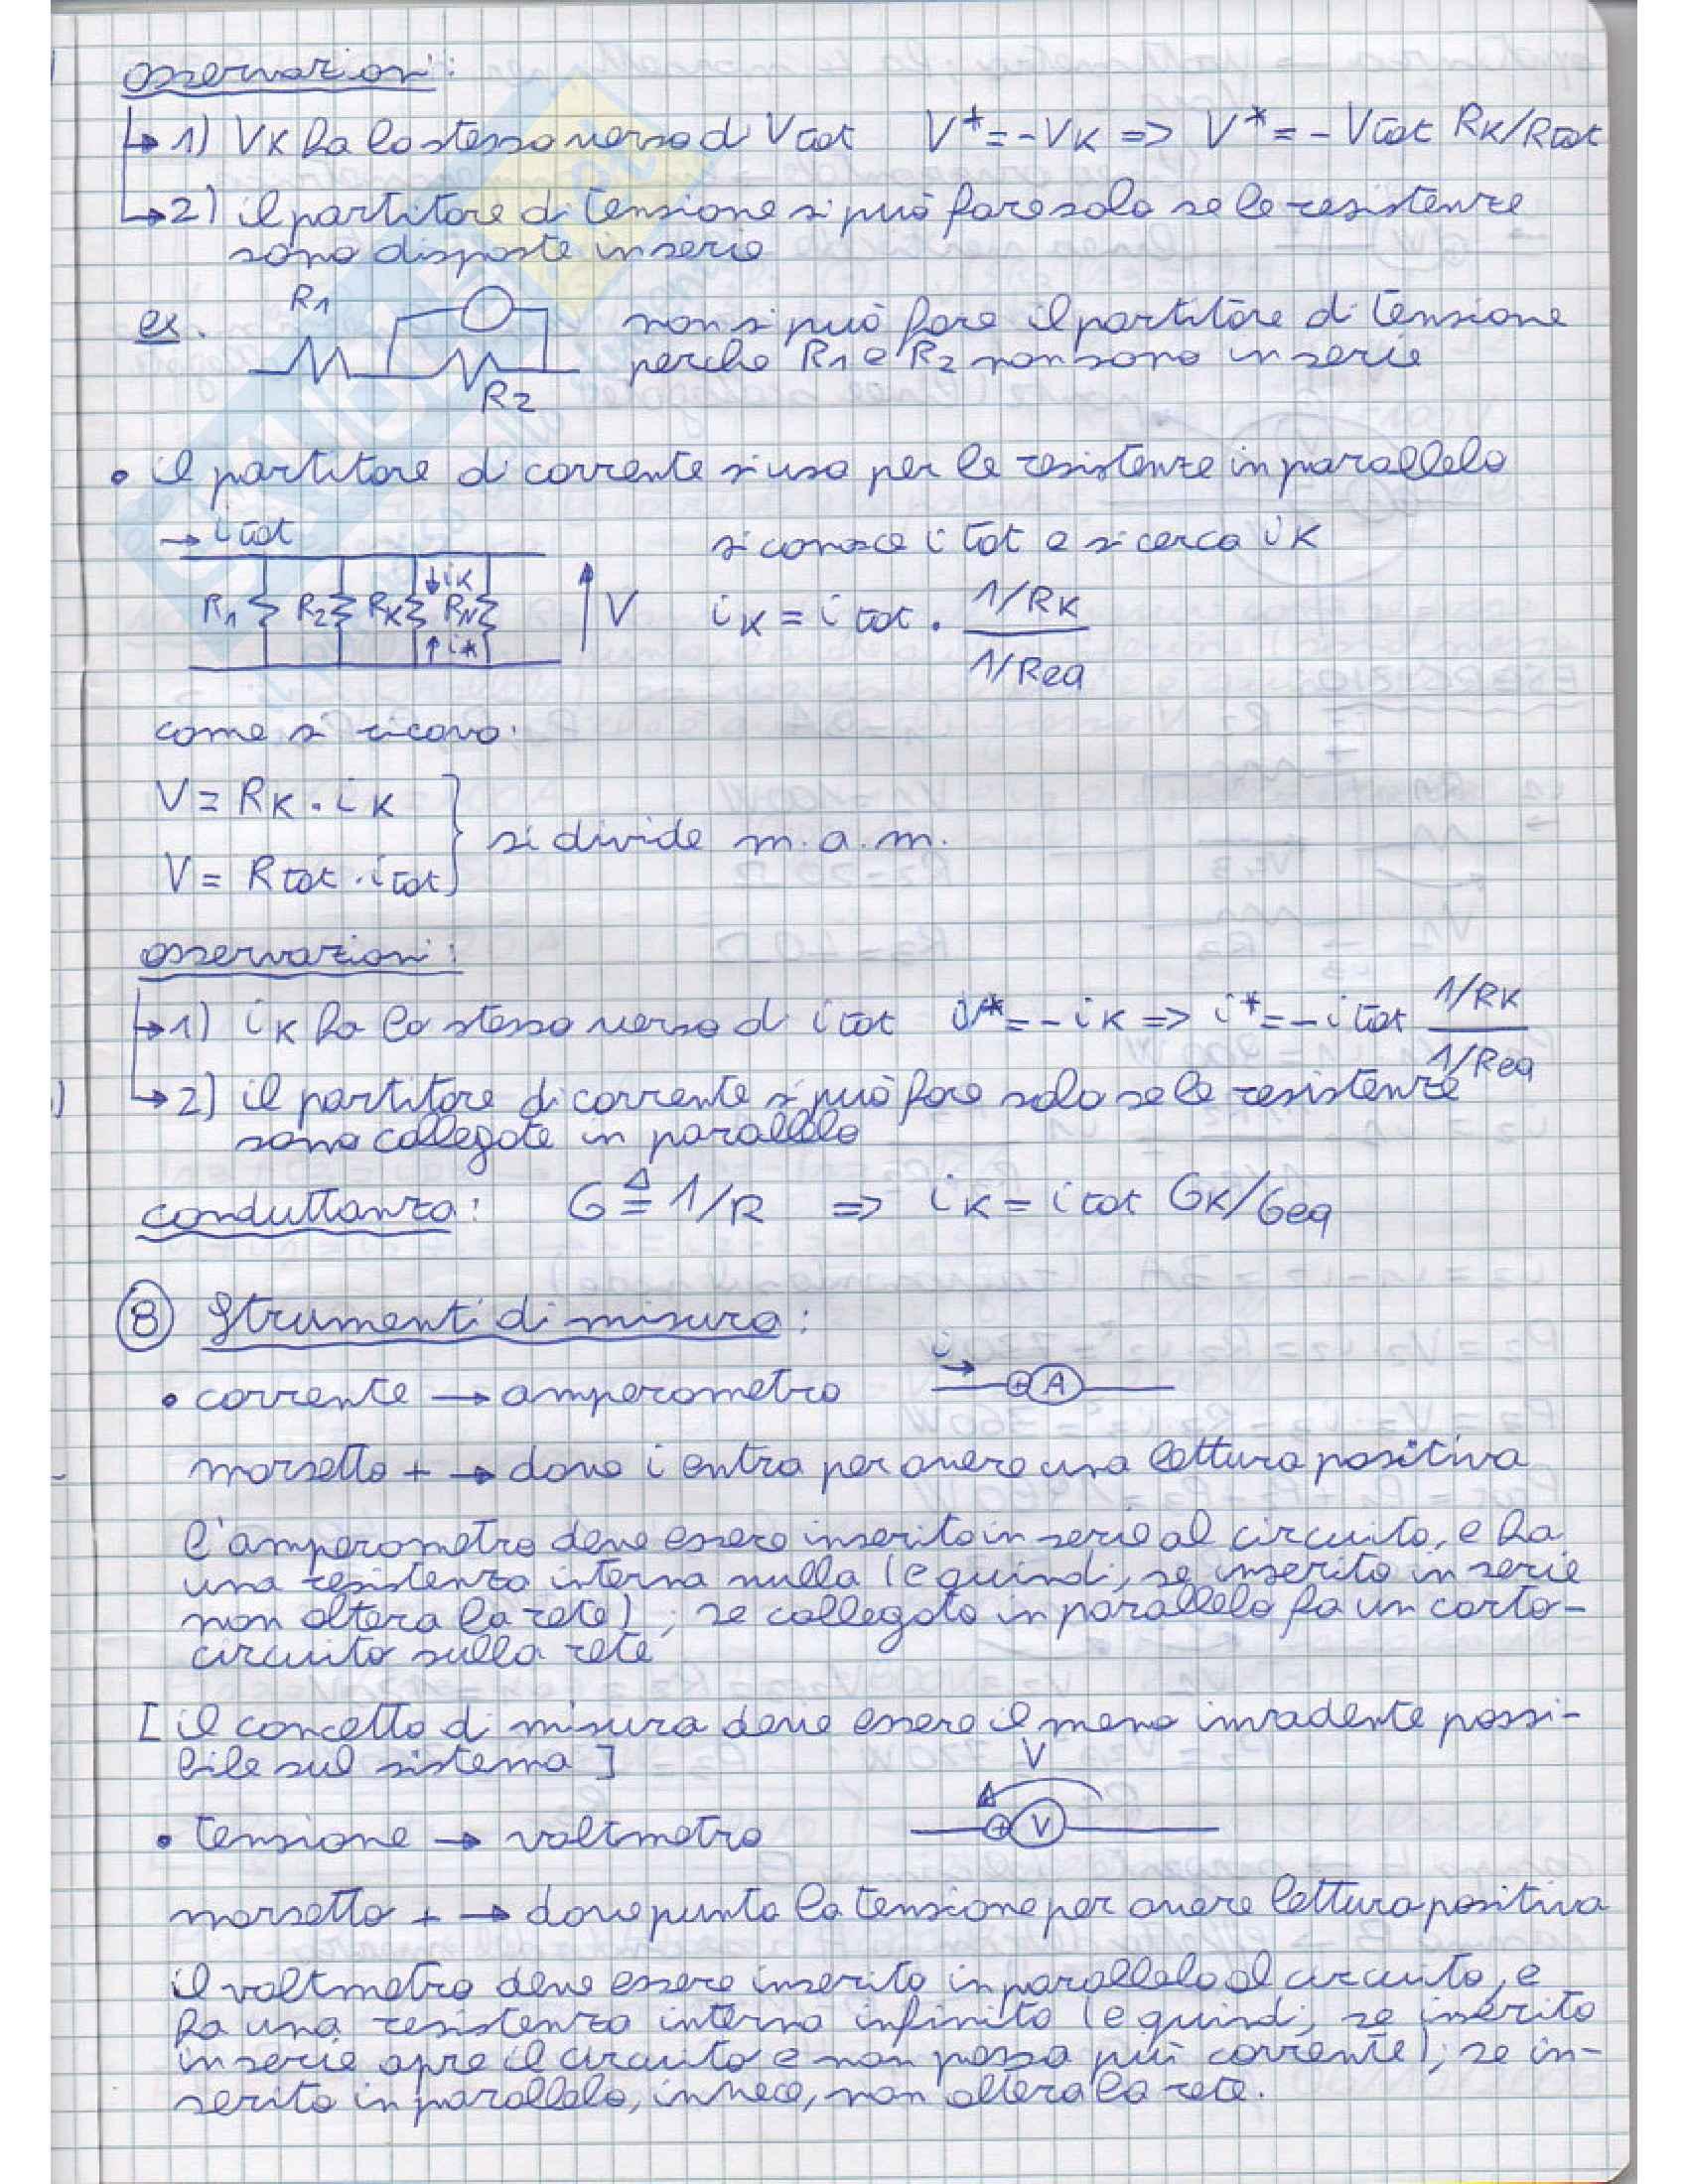 Principi di ingegneria elettrica - Appunti Pag. 11